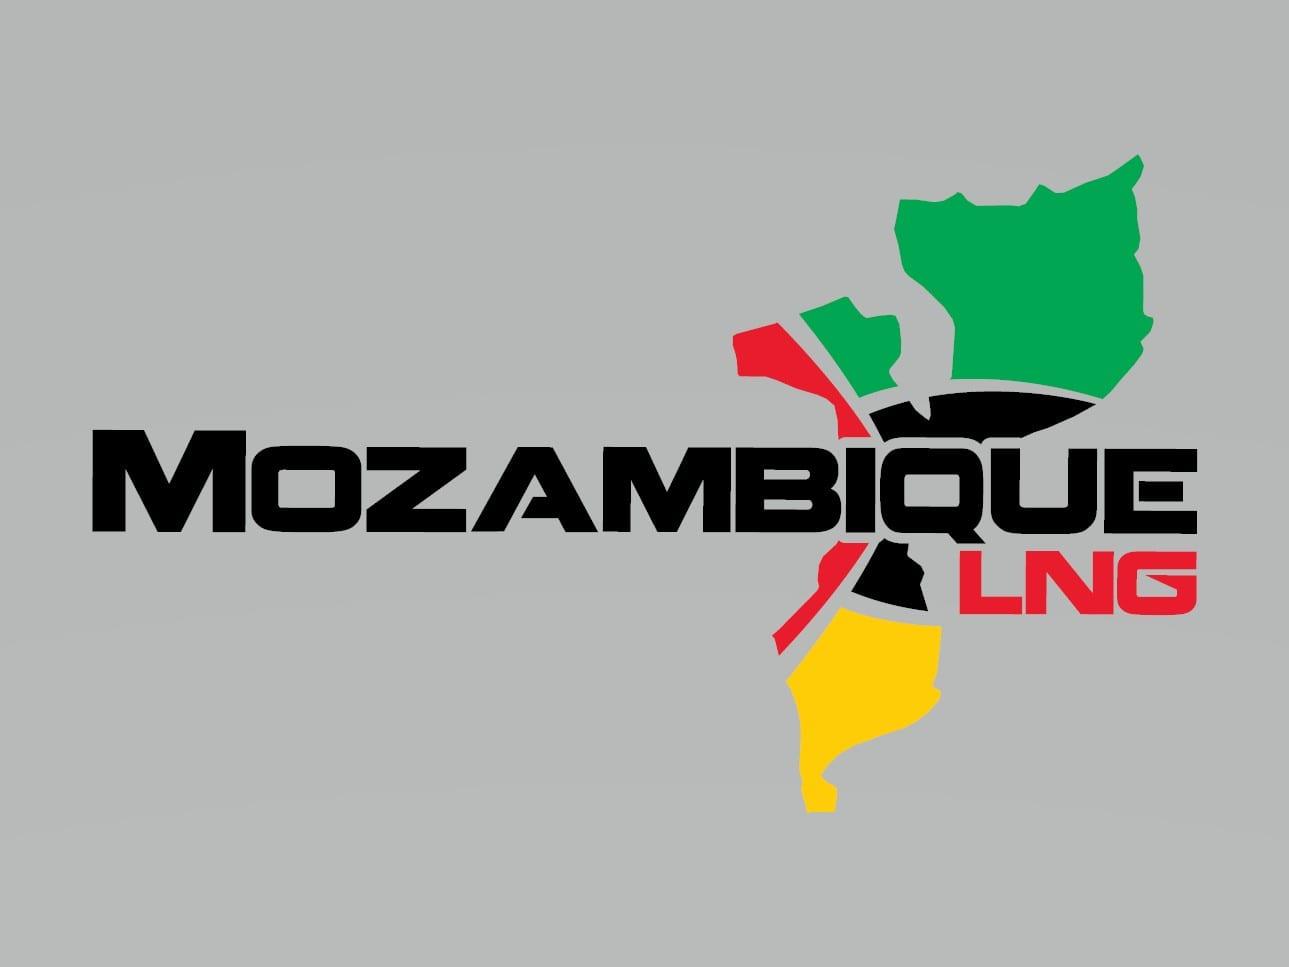 MoU for Mozambique LNG project